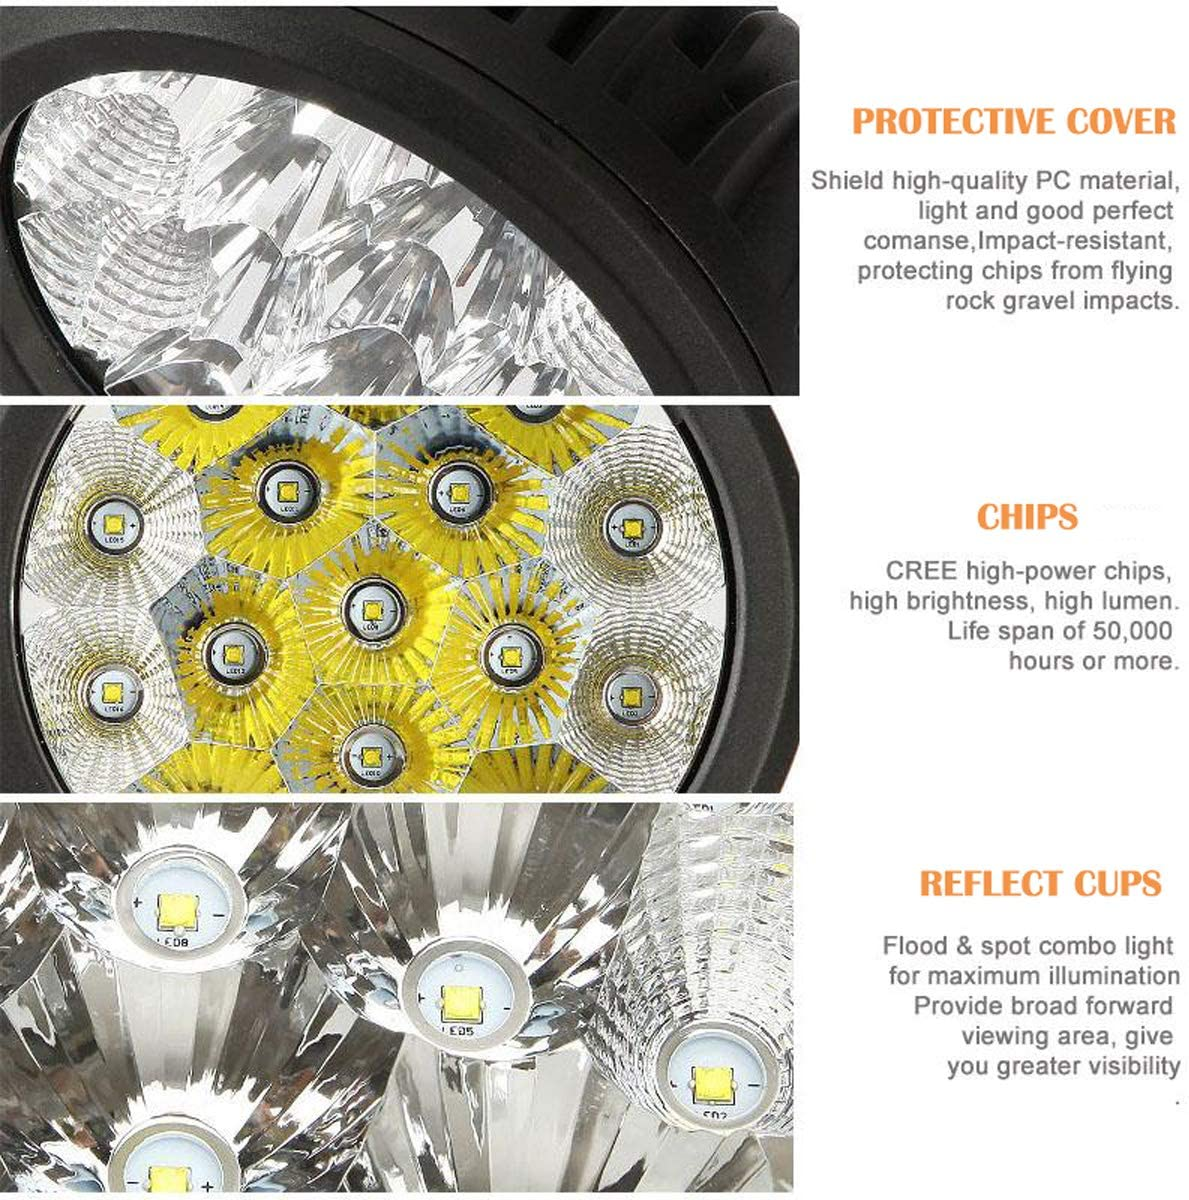 "Auxbeam 2Pcs 7"" LED Driving Light 80w Round LED Off-Road Light Bar 8000lm Combo Beams for Jeep ATV UTV Golf cart Lighting Trucks Pickup Ford f150 Work Light: Automotive"